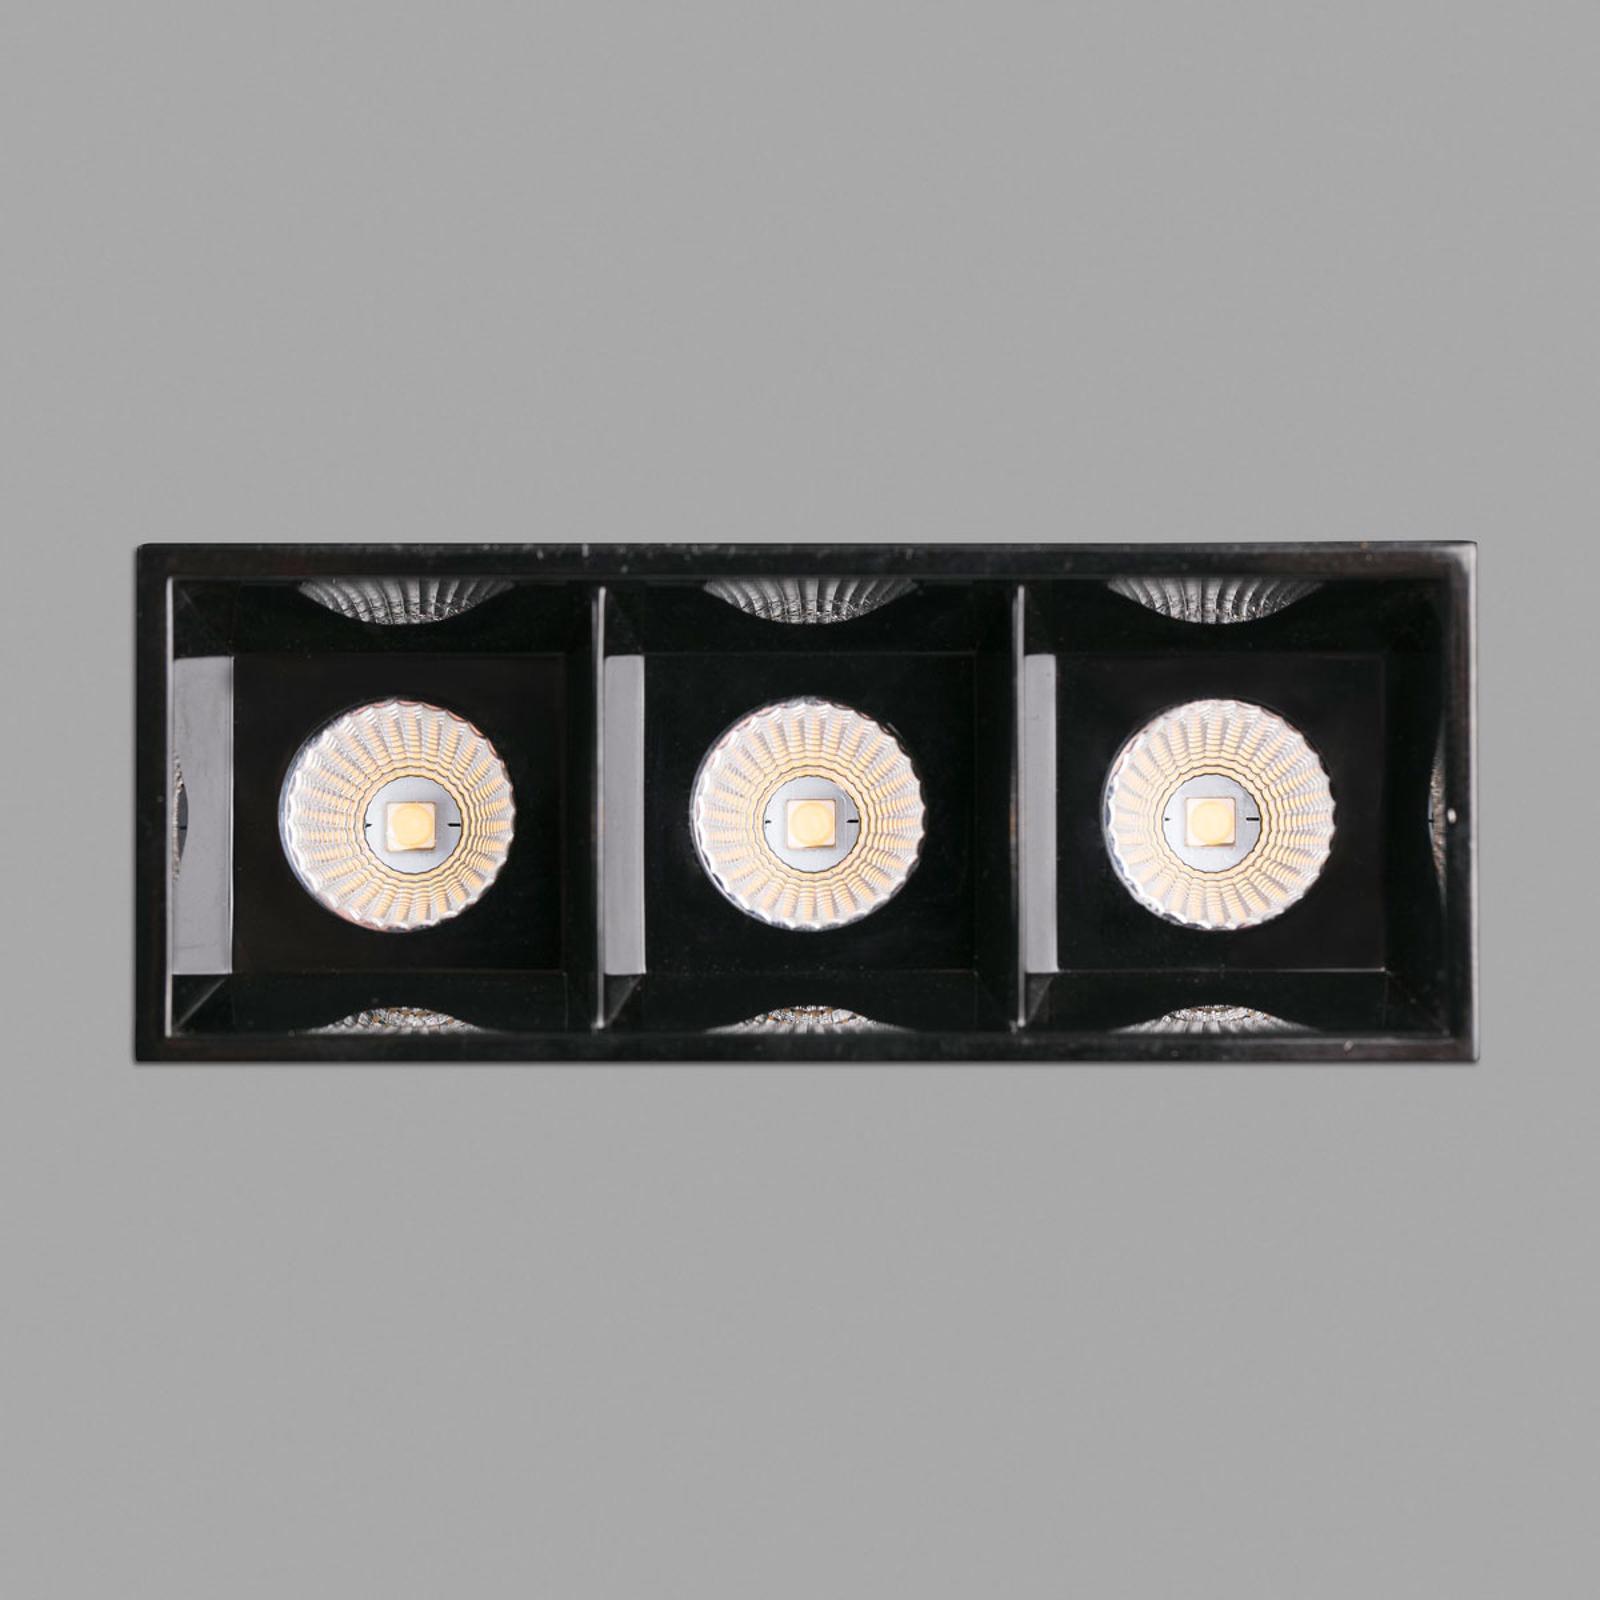 LED-Einbauleuchte Troop Trimless, 3-flammig